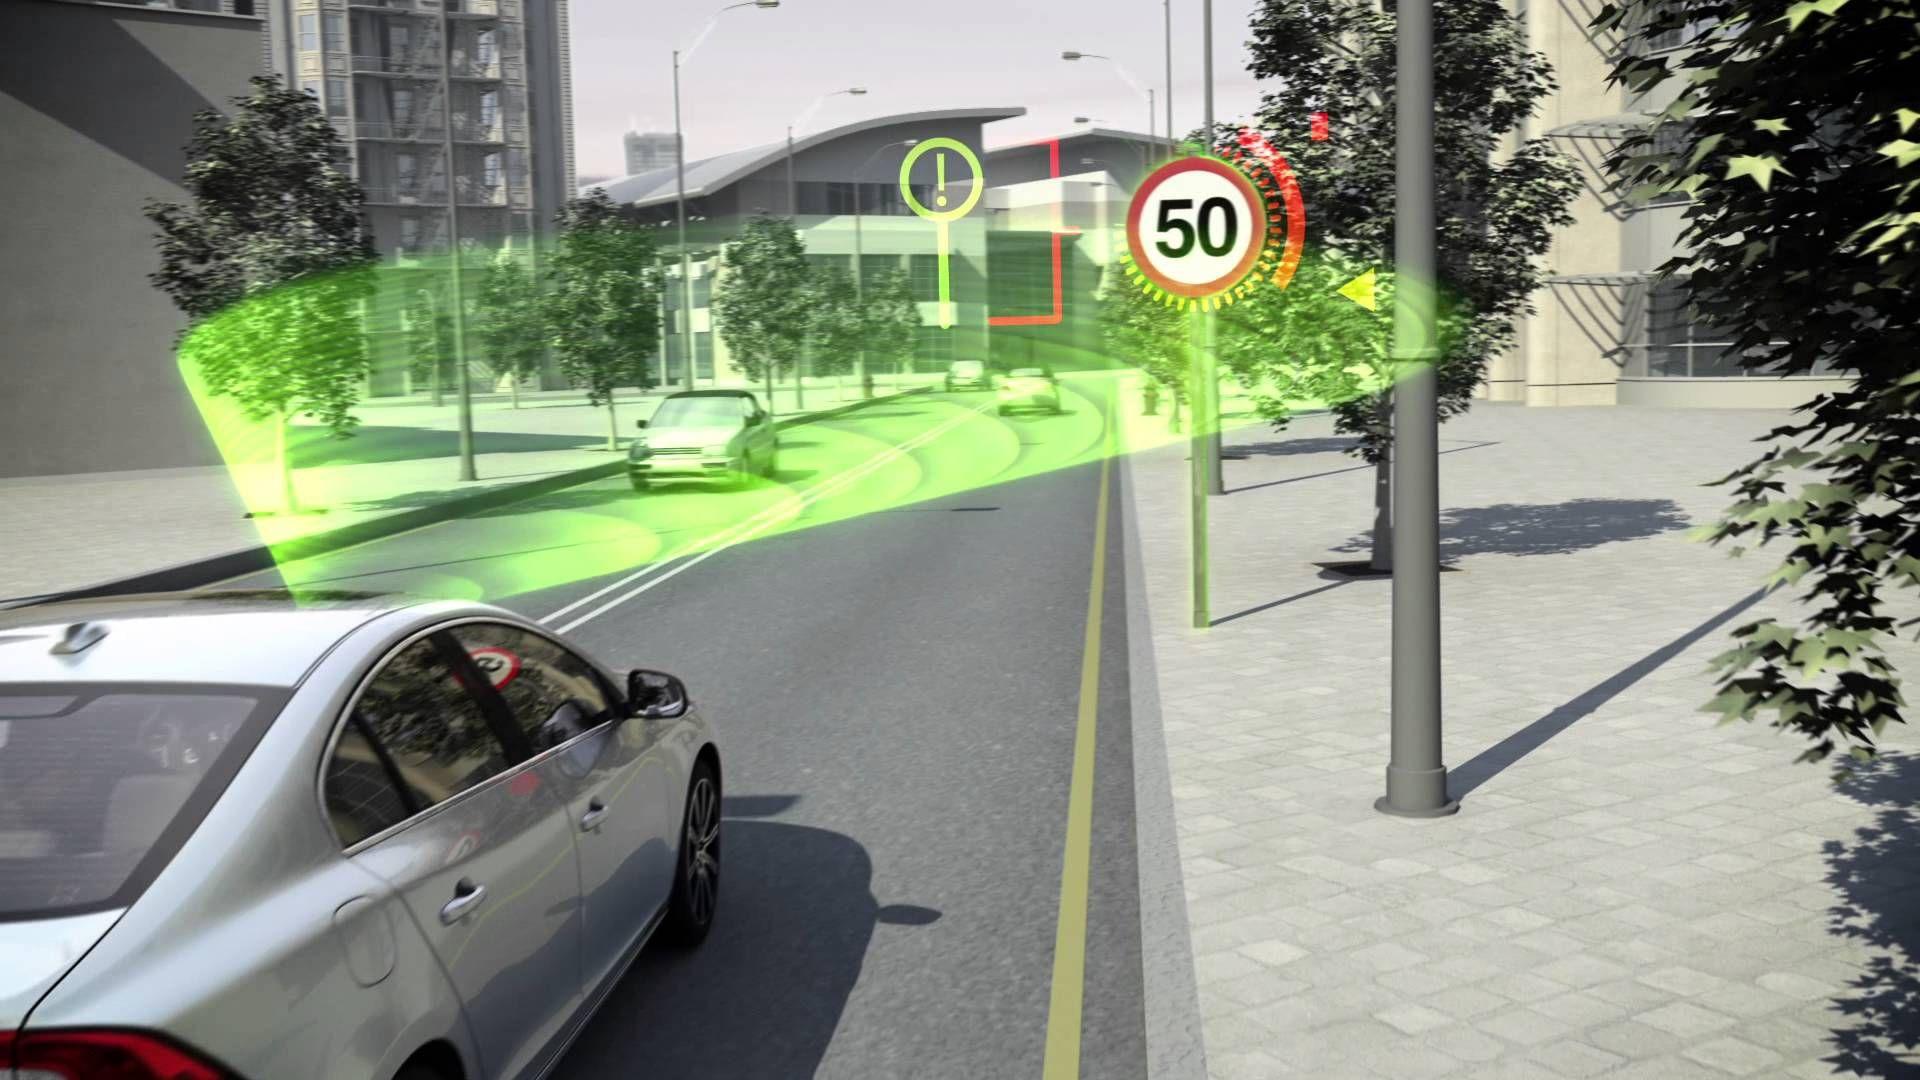 Volvo traffic signs recognition system | Car, Volvo, Volvo cars